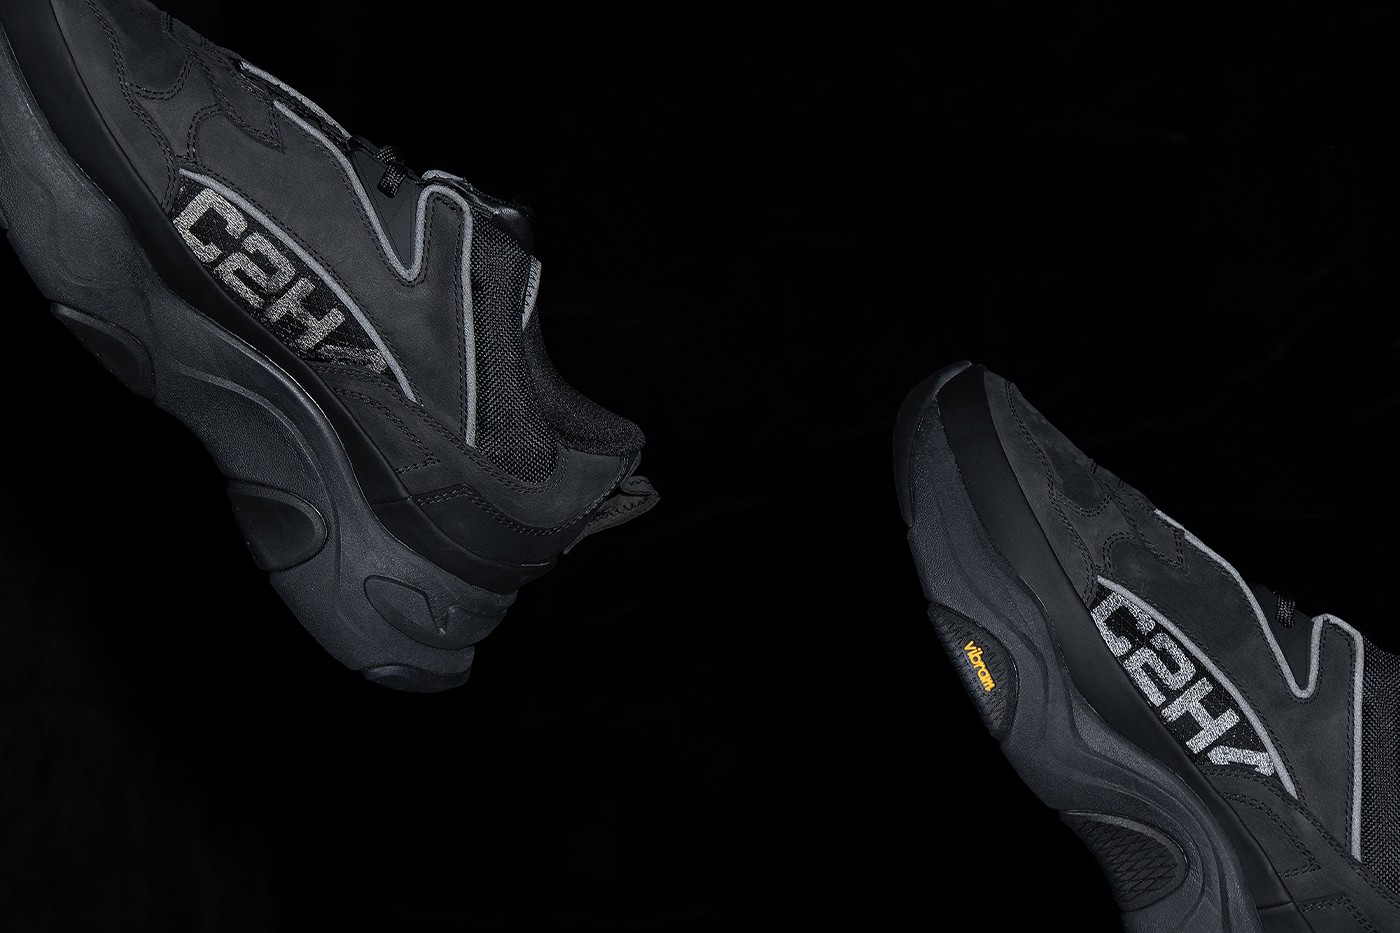 https___hypebeast.com_image_2020_11_c2h4-footwear-atom-alpha-quark-alpha-release-info-004